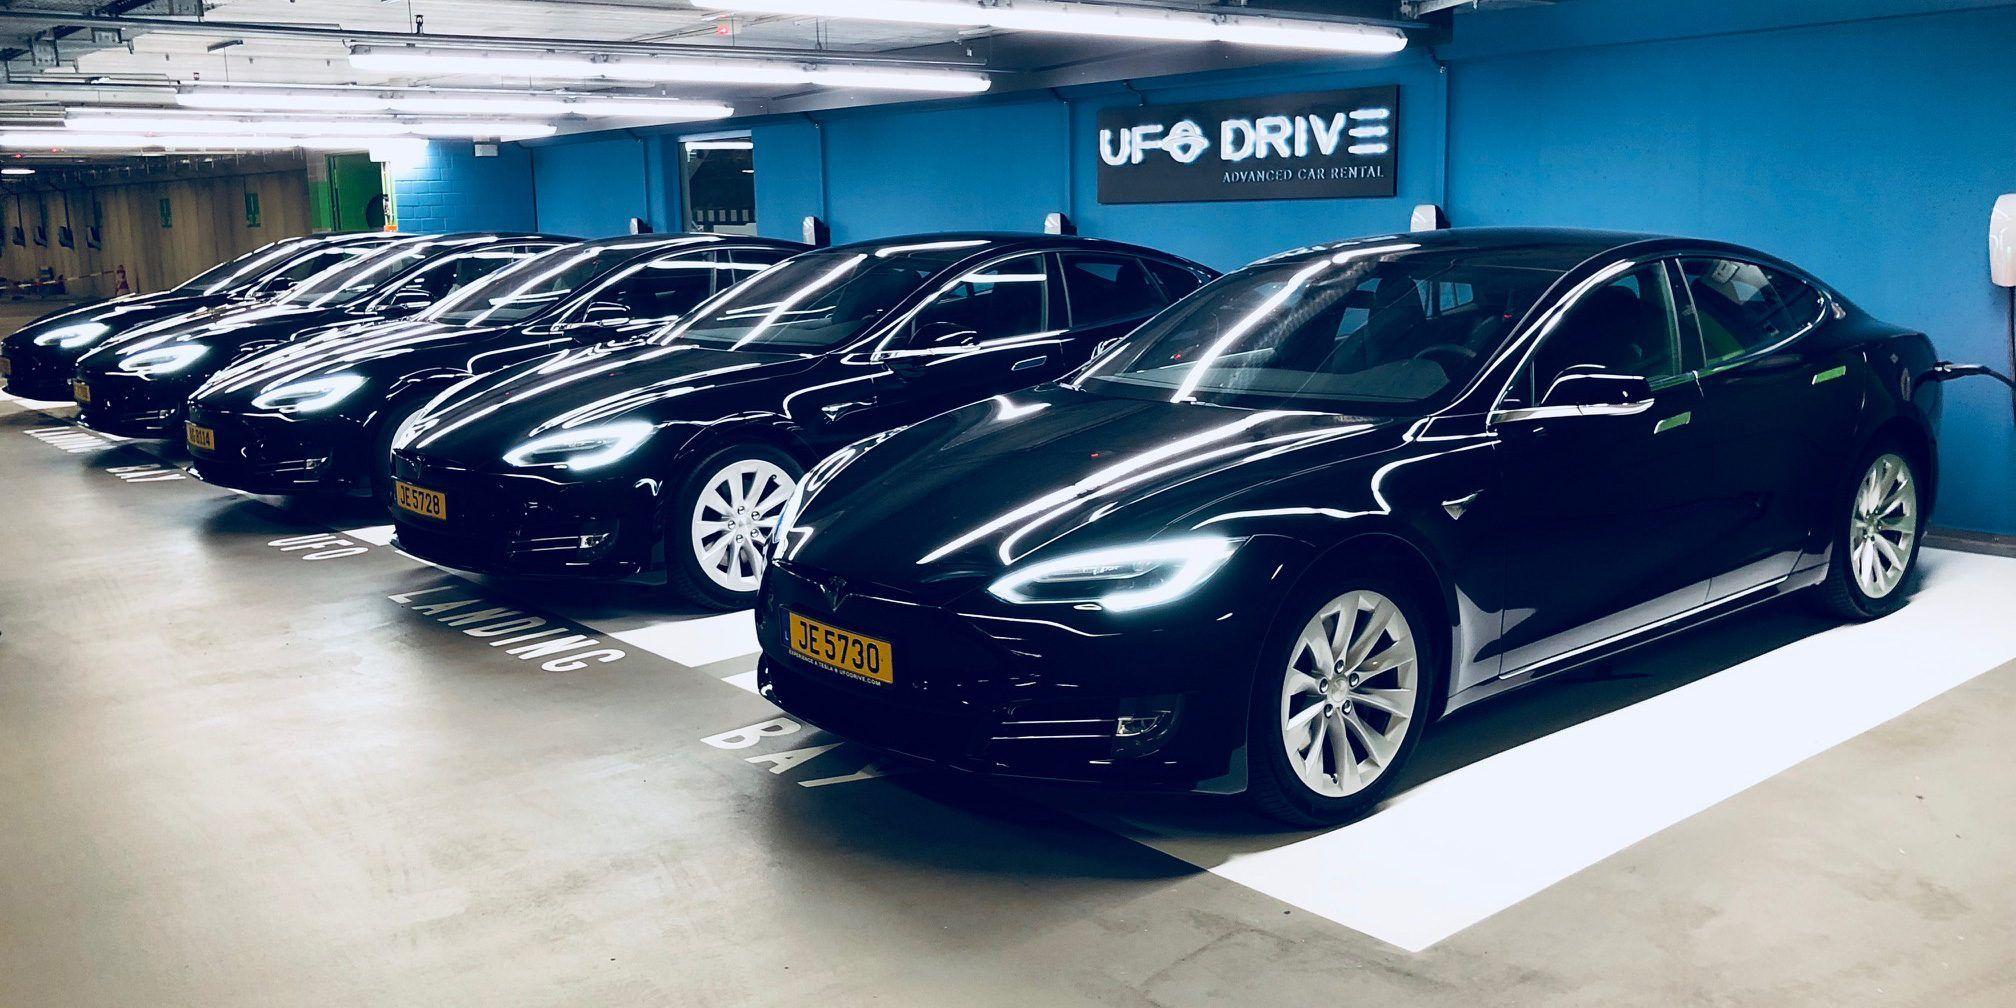 27+ Enterprise luxury car rentals iphone